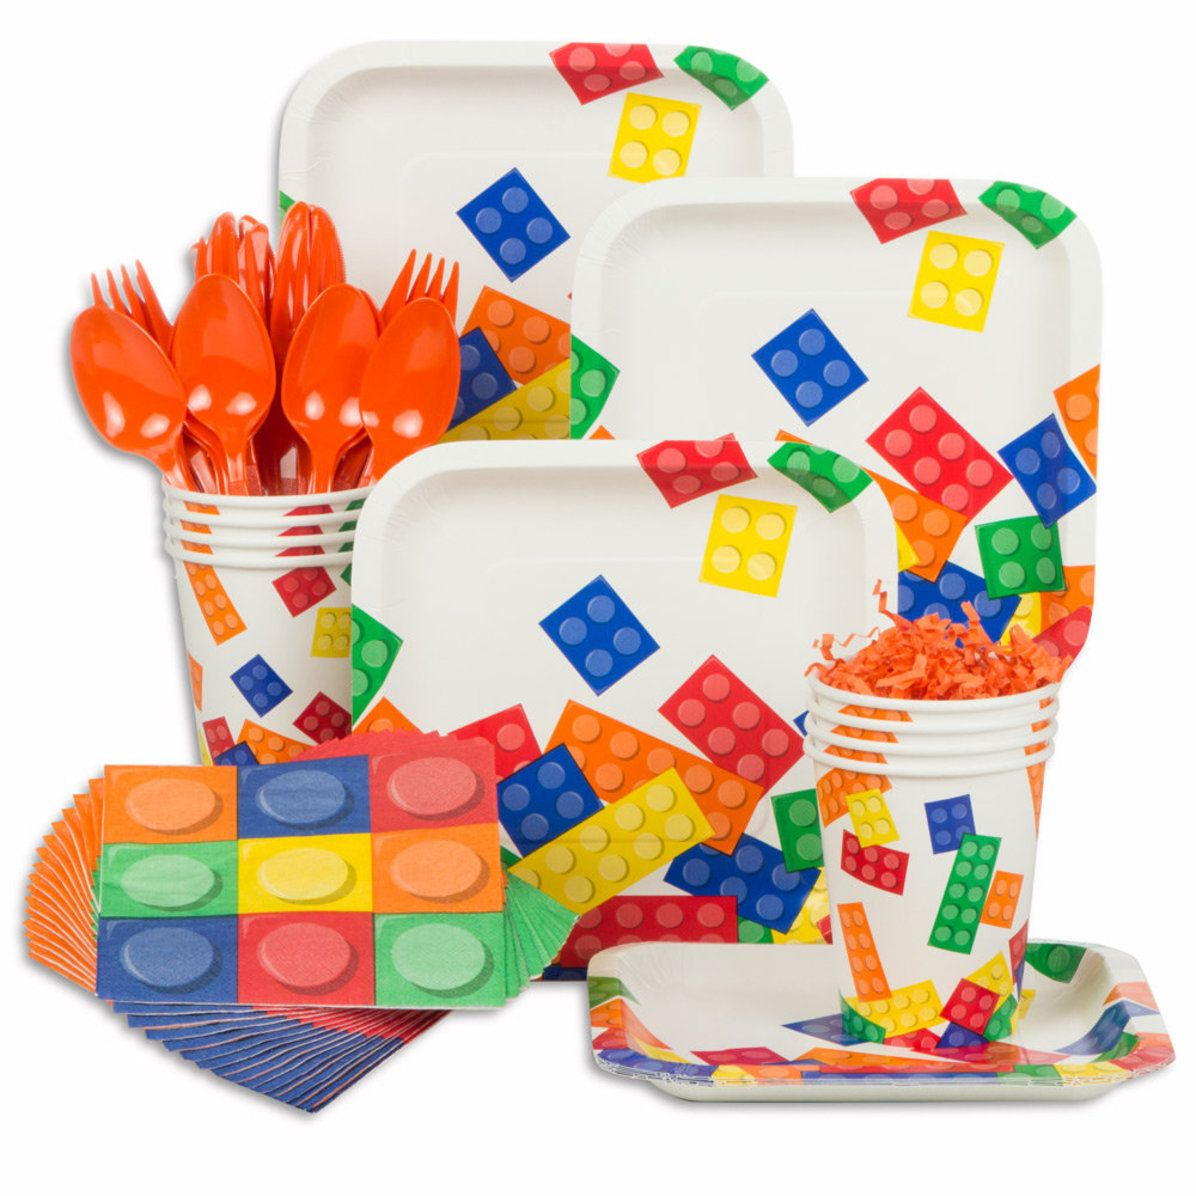 Block Party Birthday Standard Tableware Kit (Serves 8